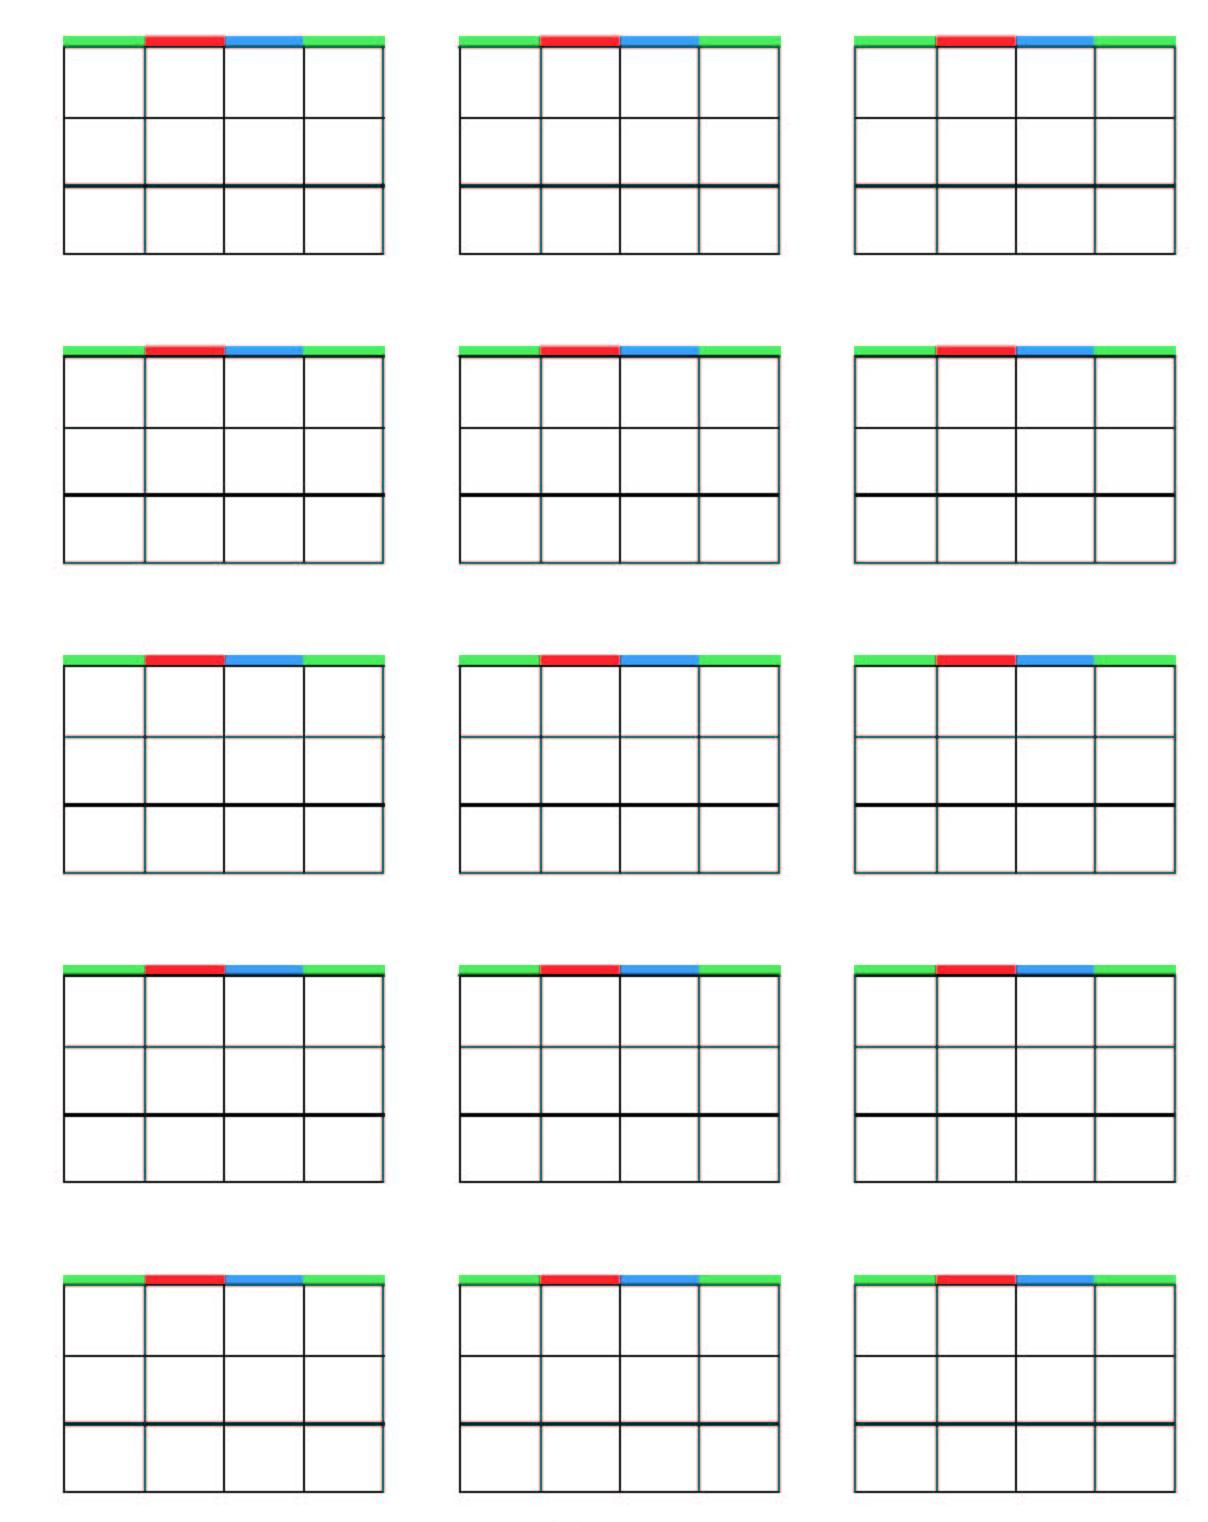 Worksheet For Montessori